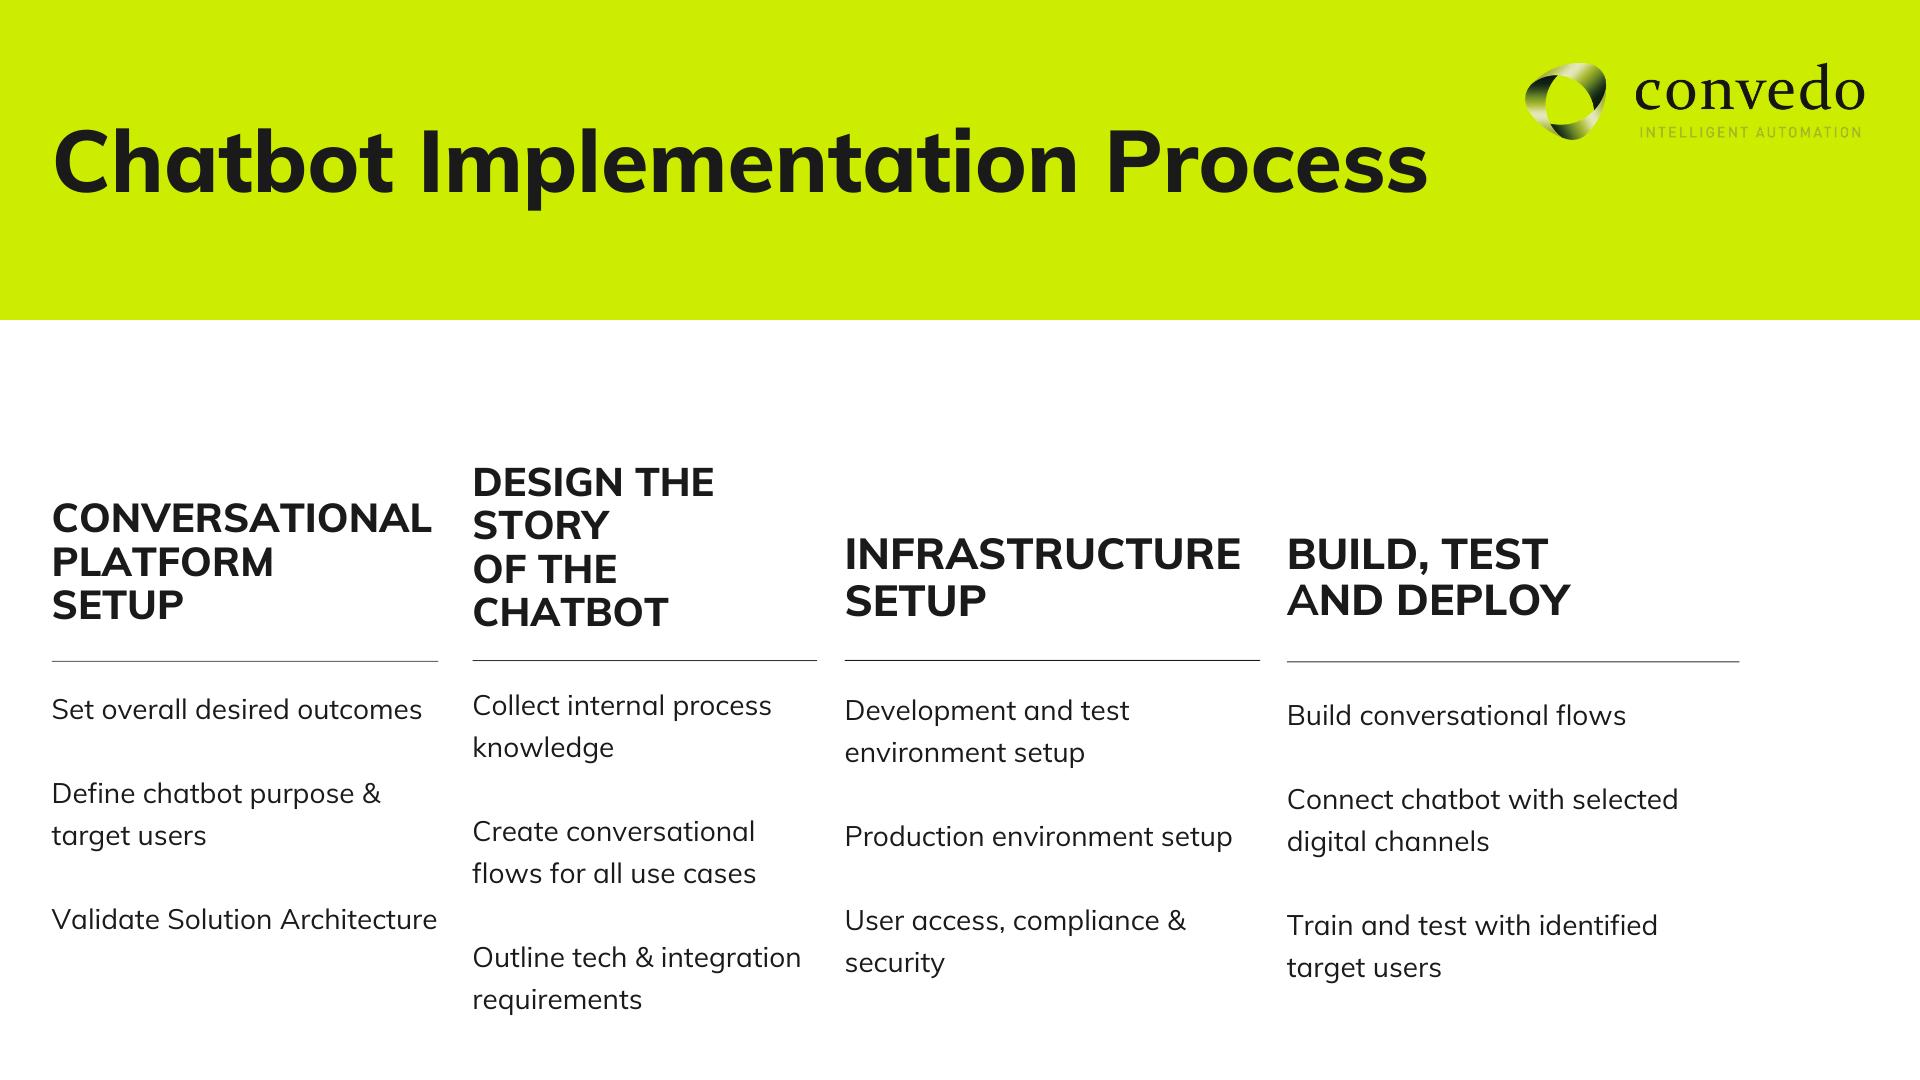 chatbot implementation process